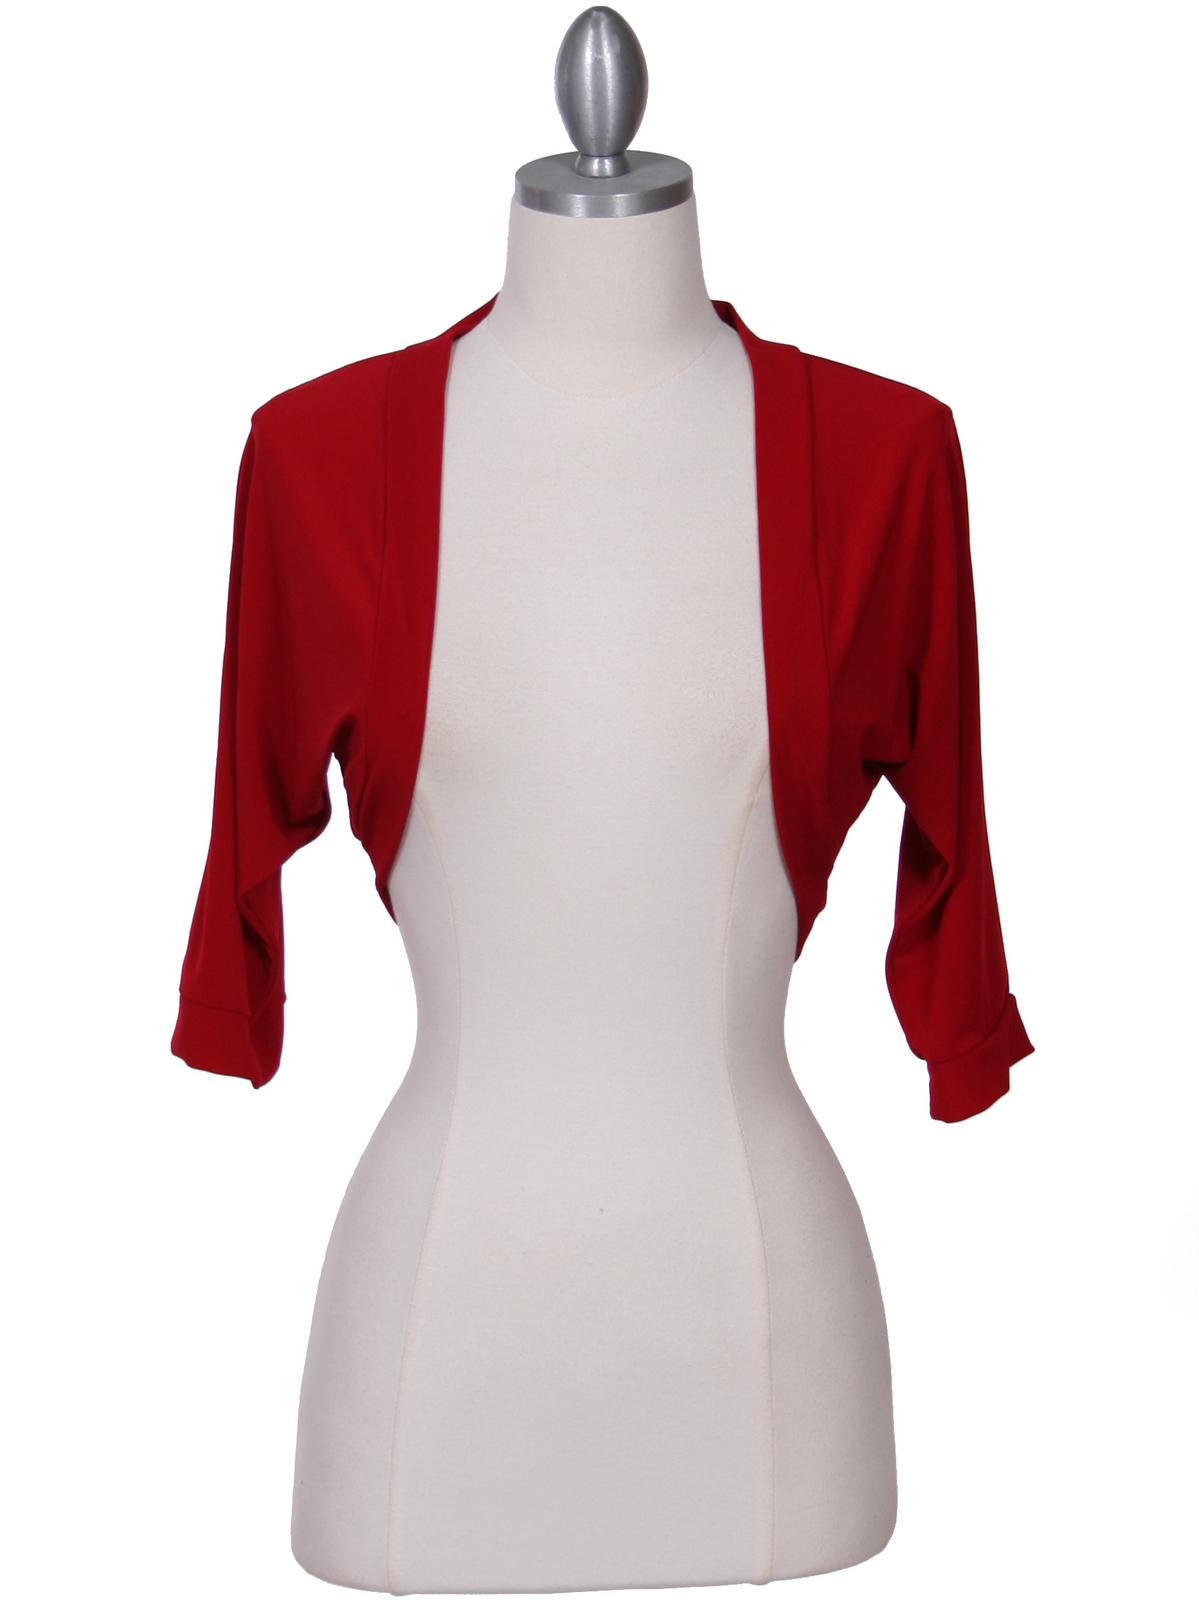 Red Bolero Jacket Sung Boutique L A